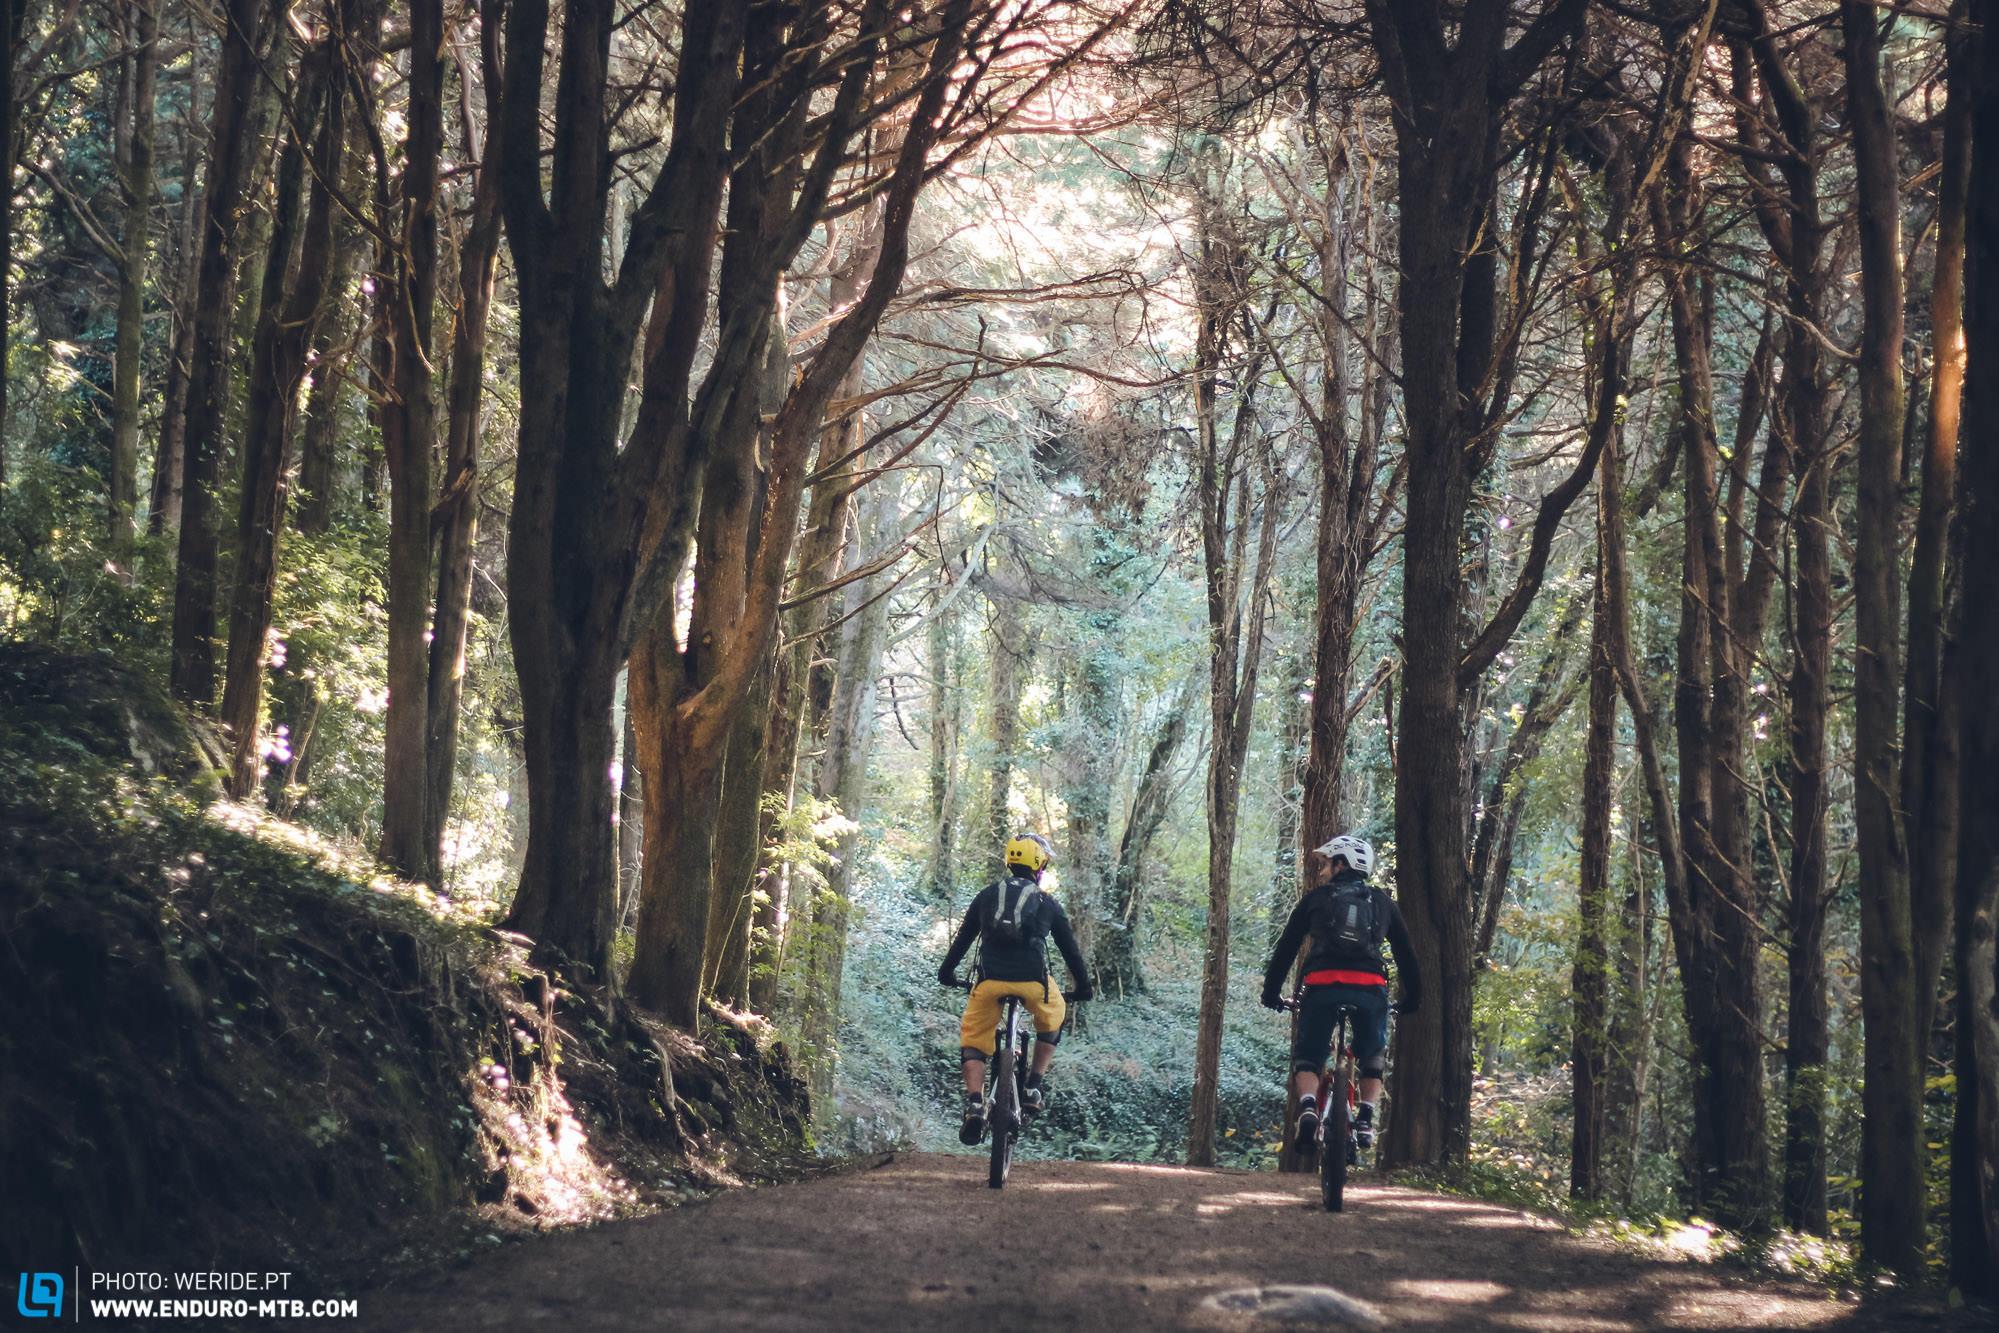 Travel-Story-Portugal-Sintra-2.jpg